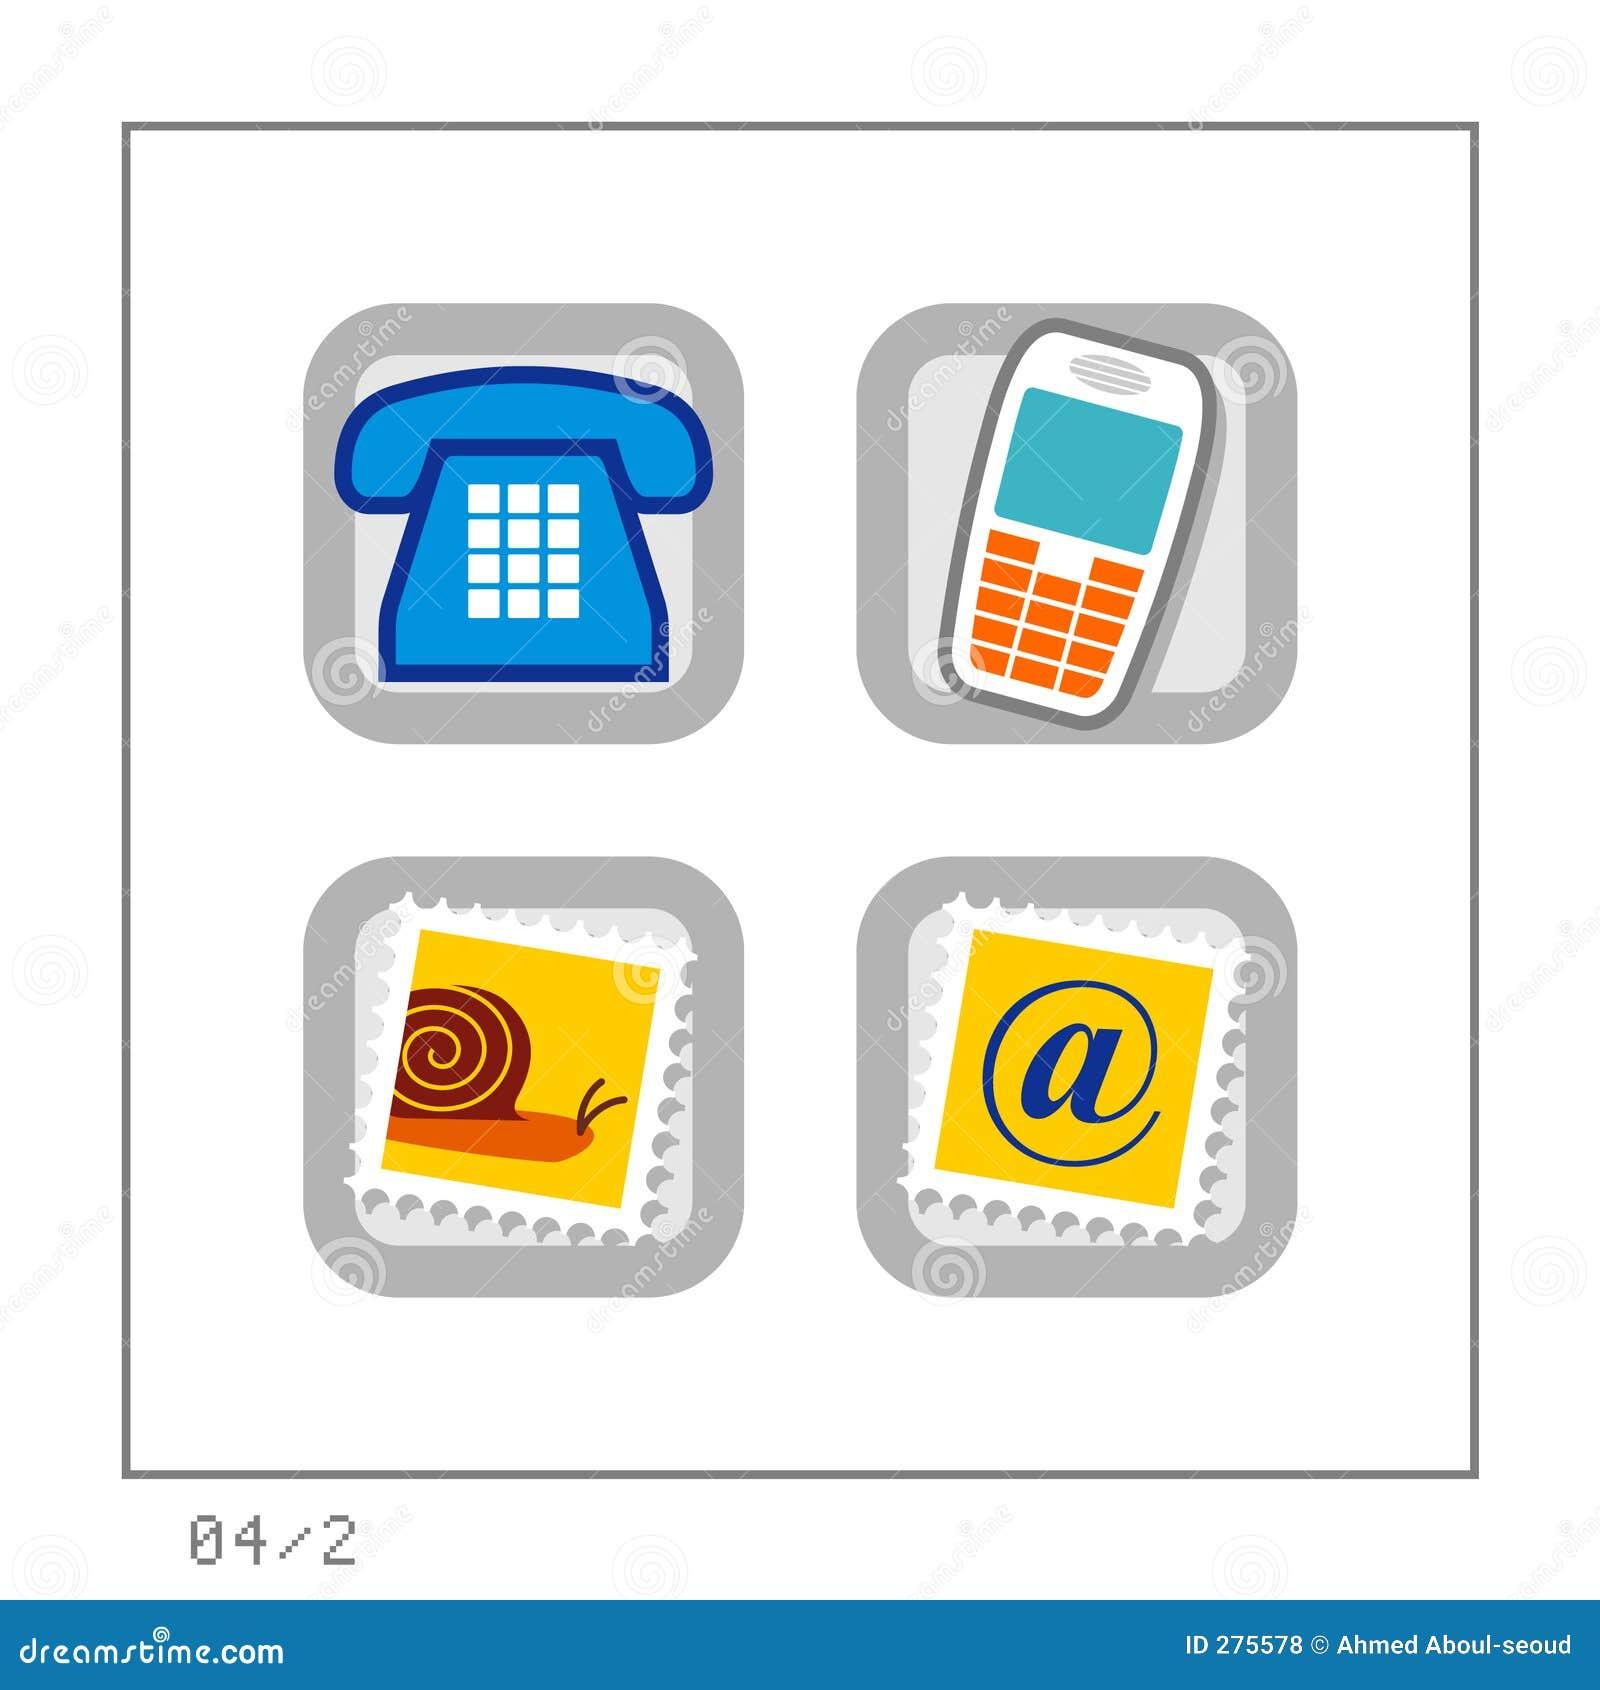 MEDEDELING: Het pictogram plaatste 04 - Versie 2